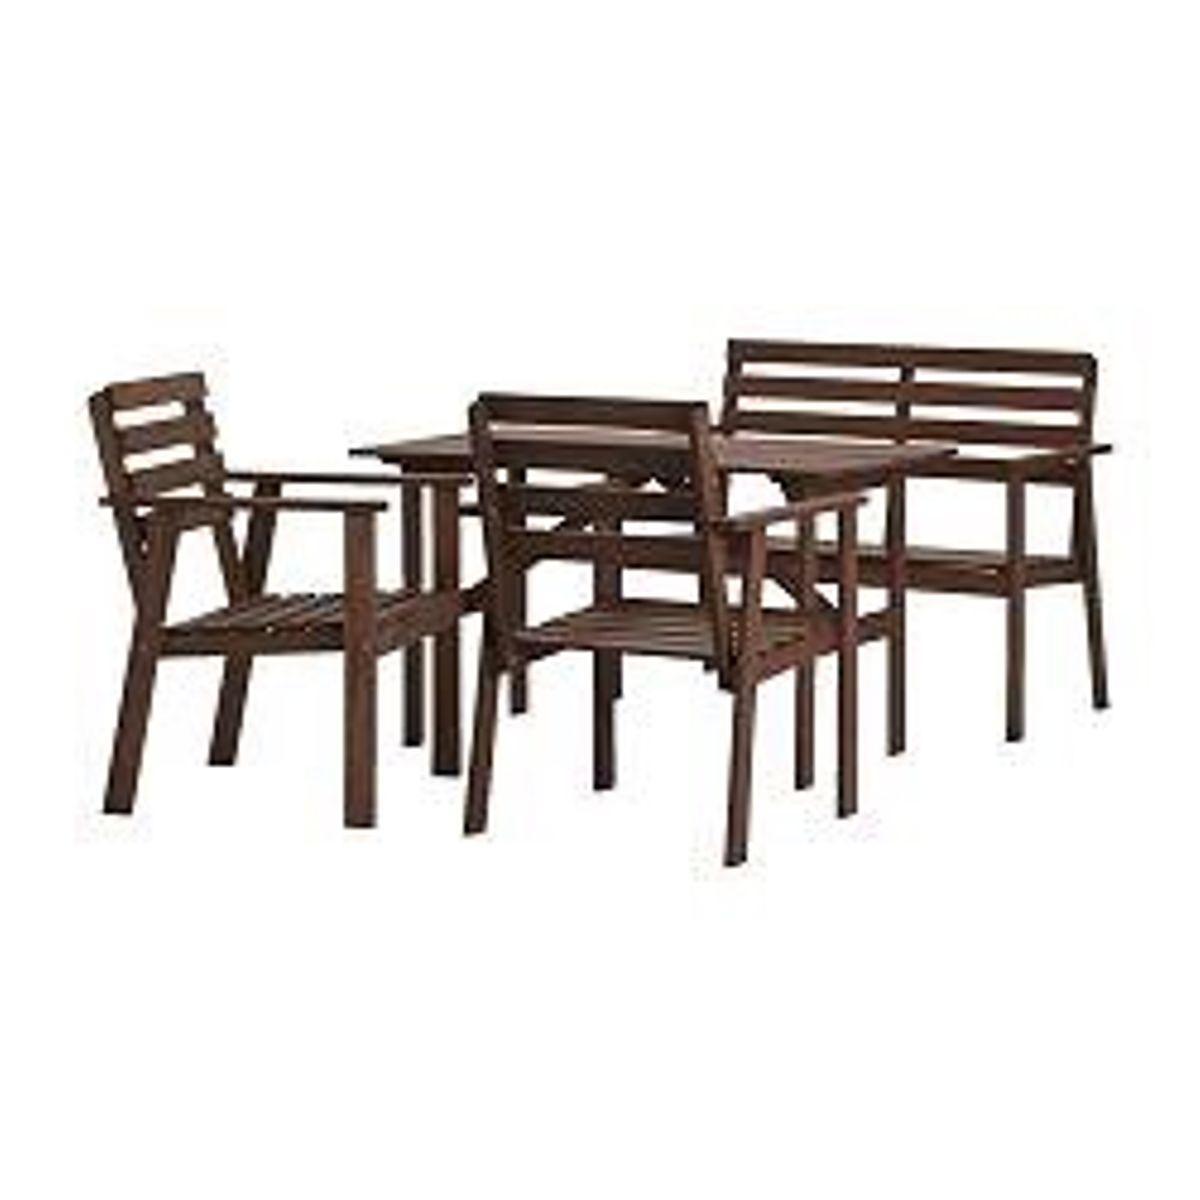 Ikea Gartenmöbel Set Holz